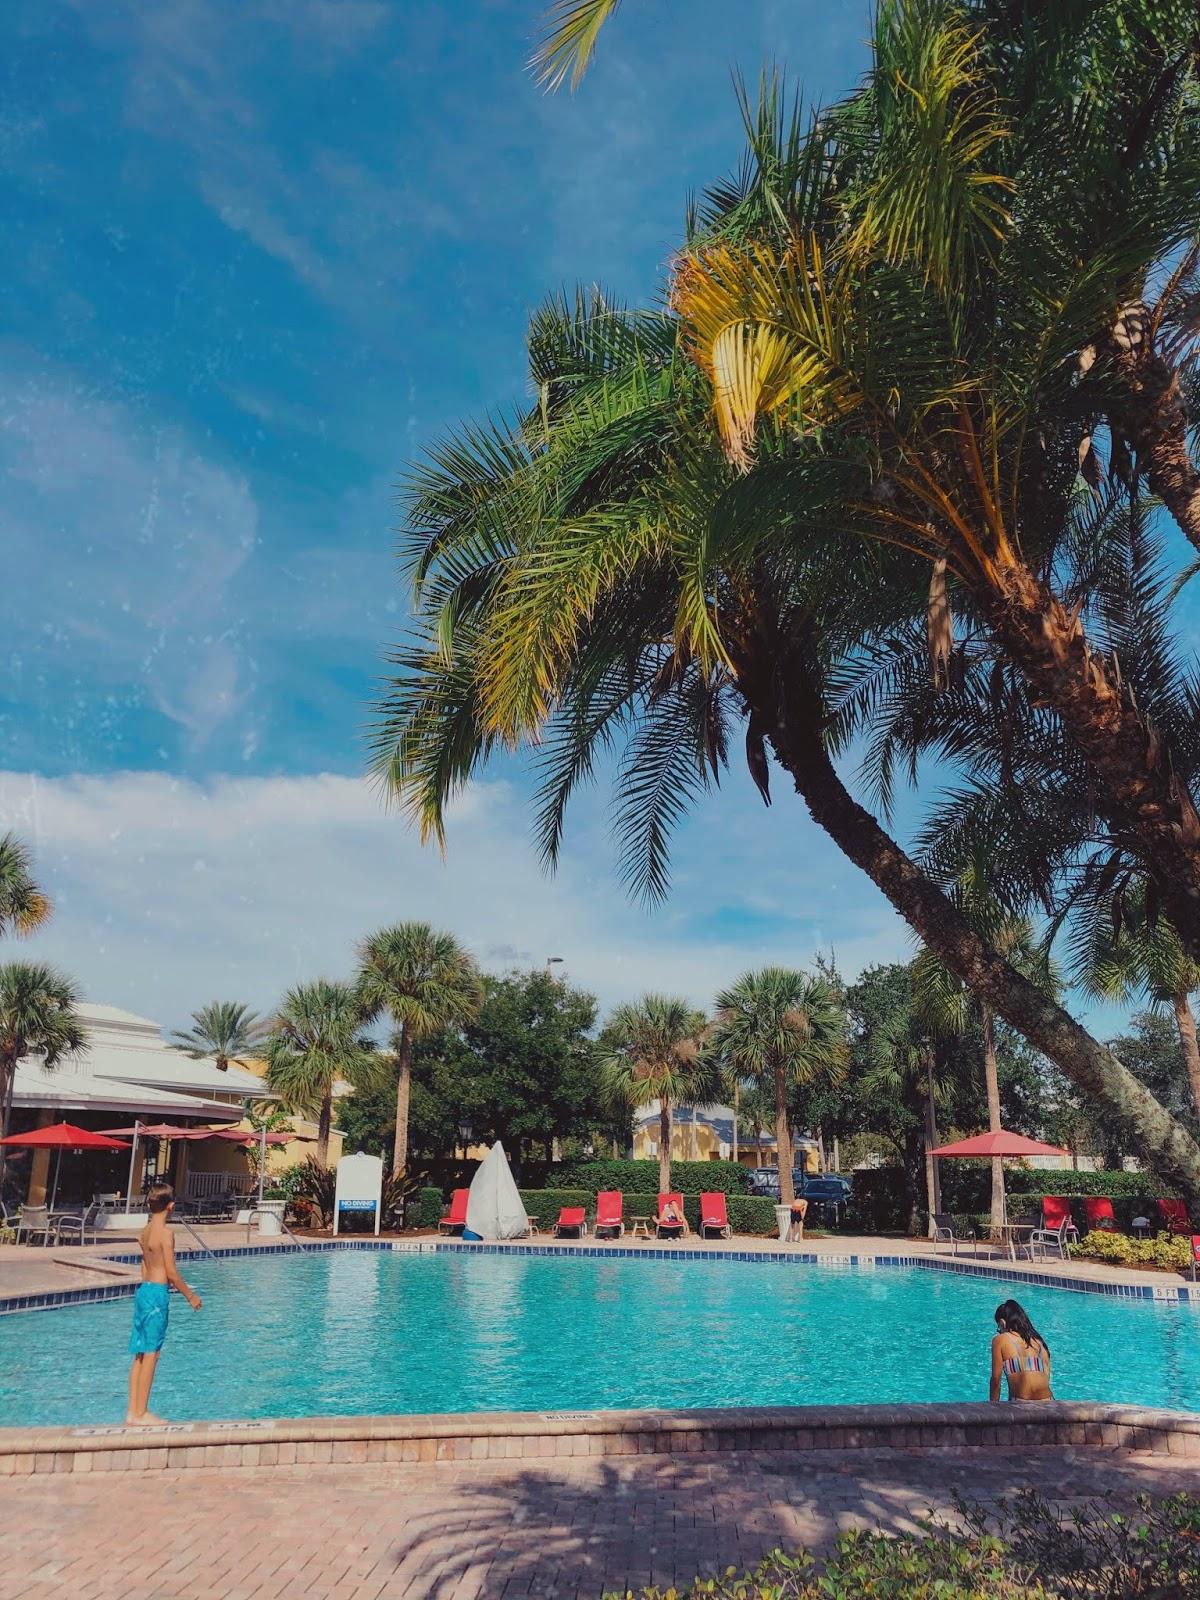 Hotel Review: Wyndham Orlando Resort International Drive. Poolside View.